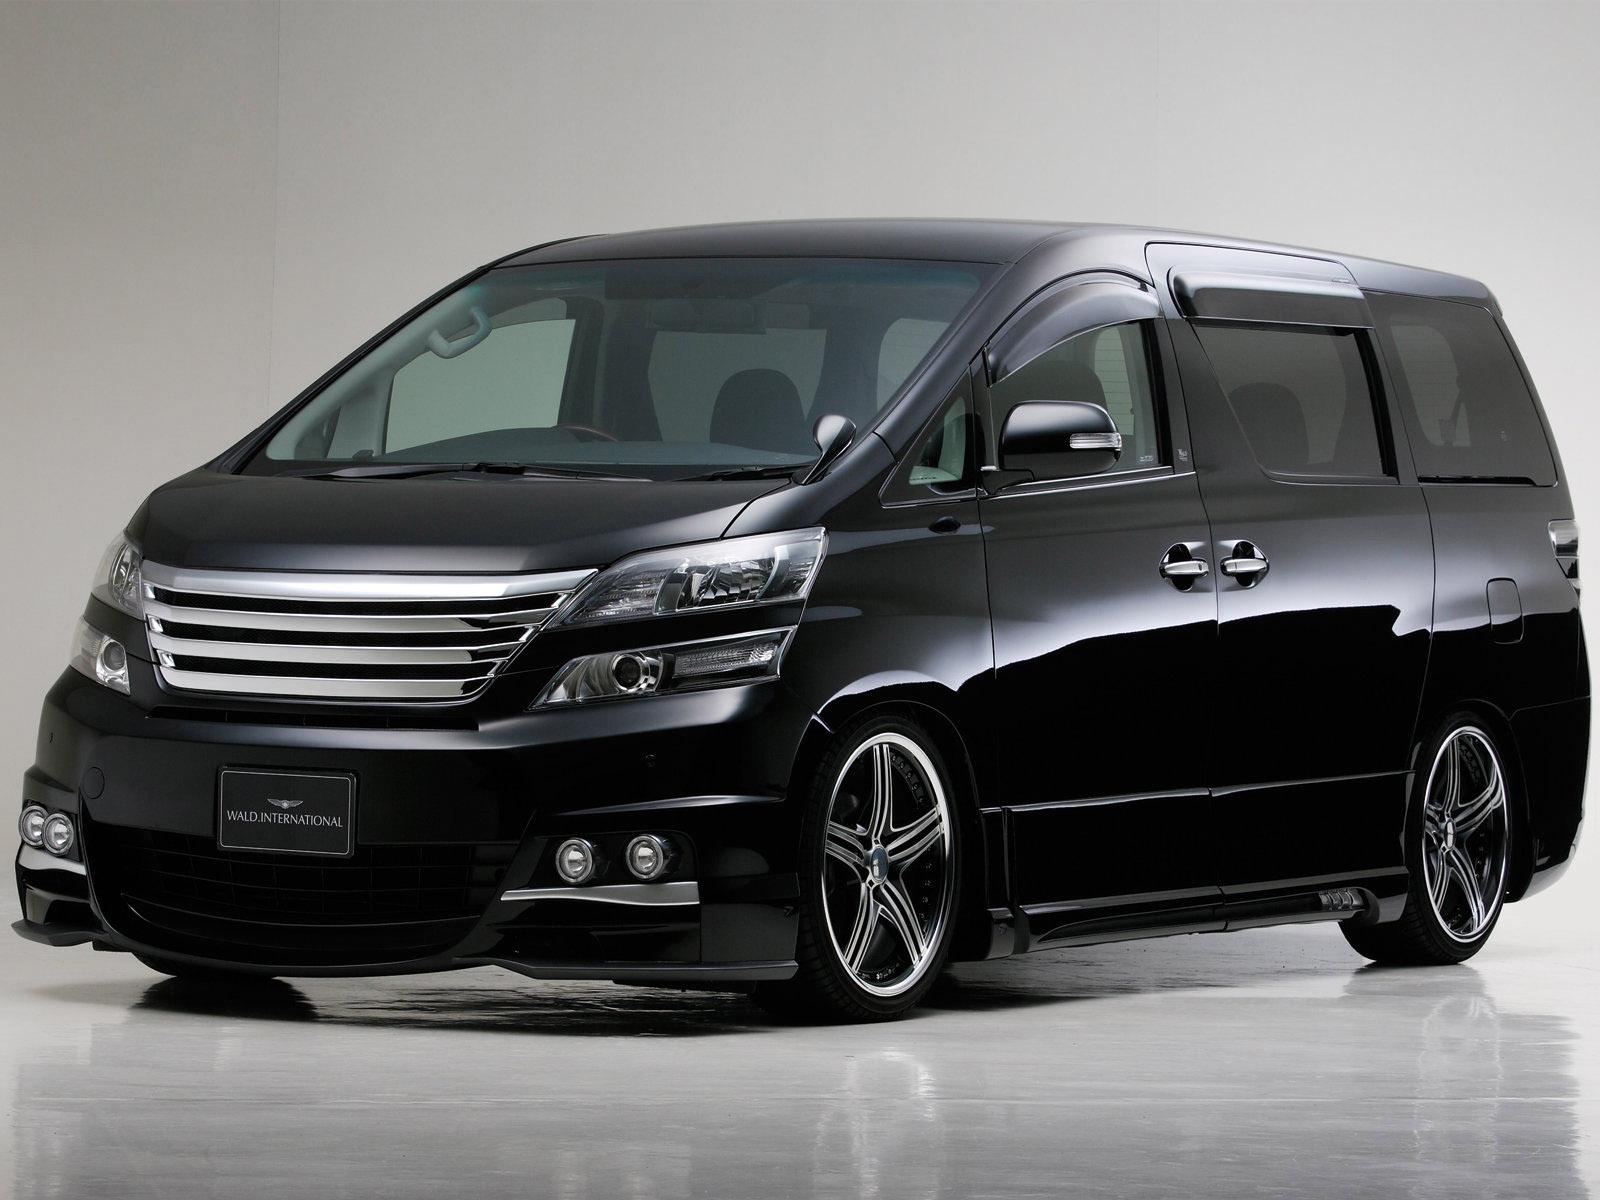 New Cars: Toyota Vellfire The Power Luxury Cars